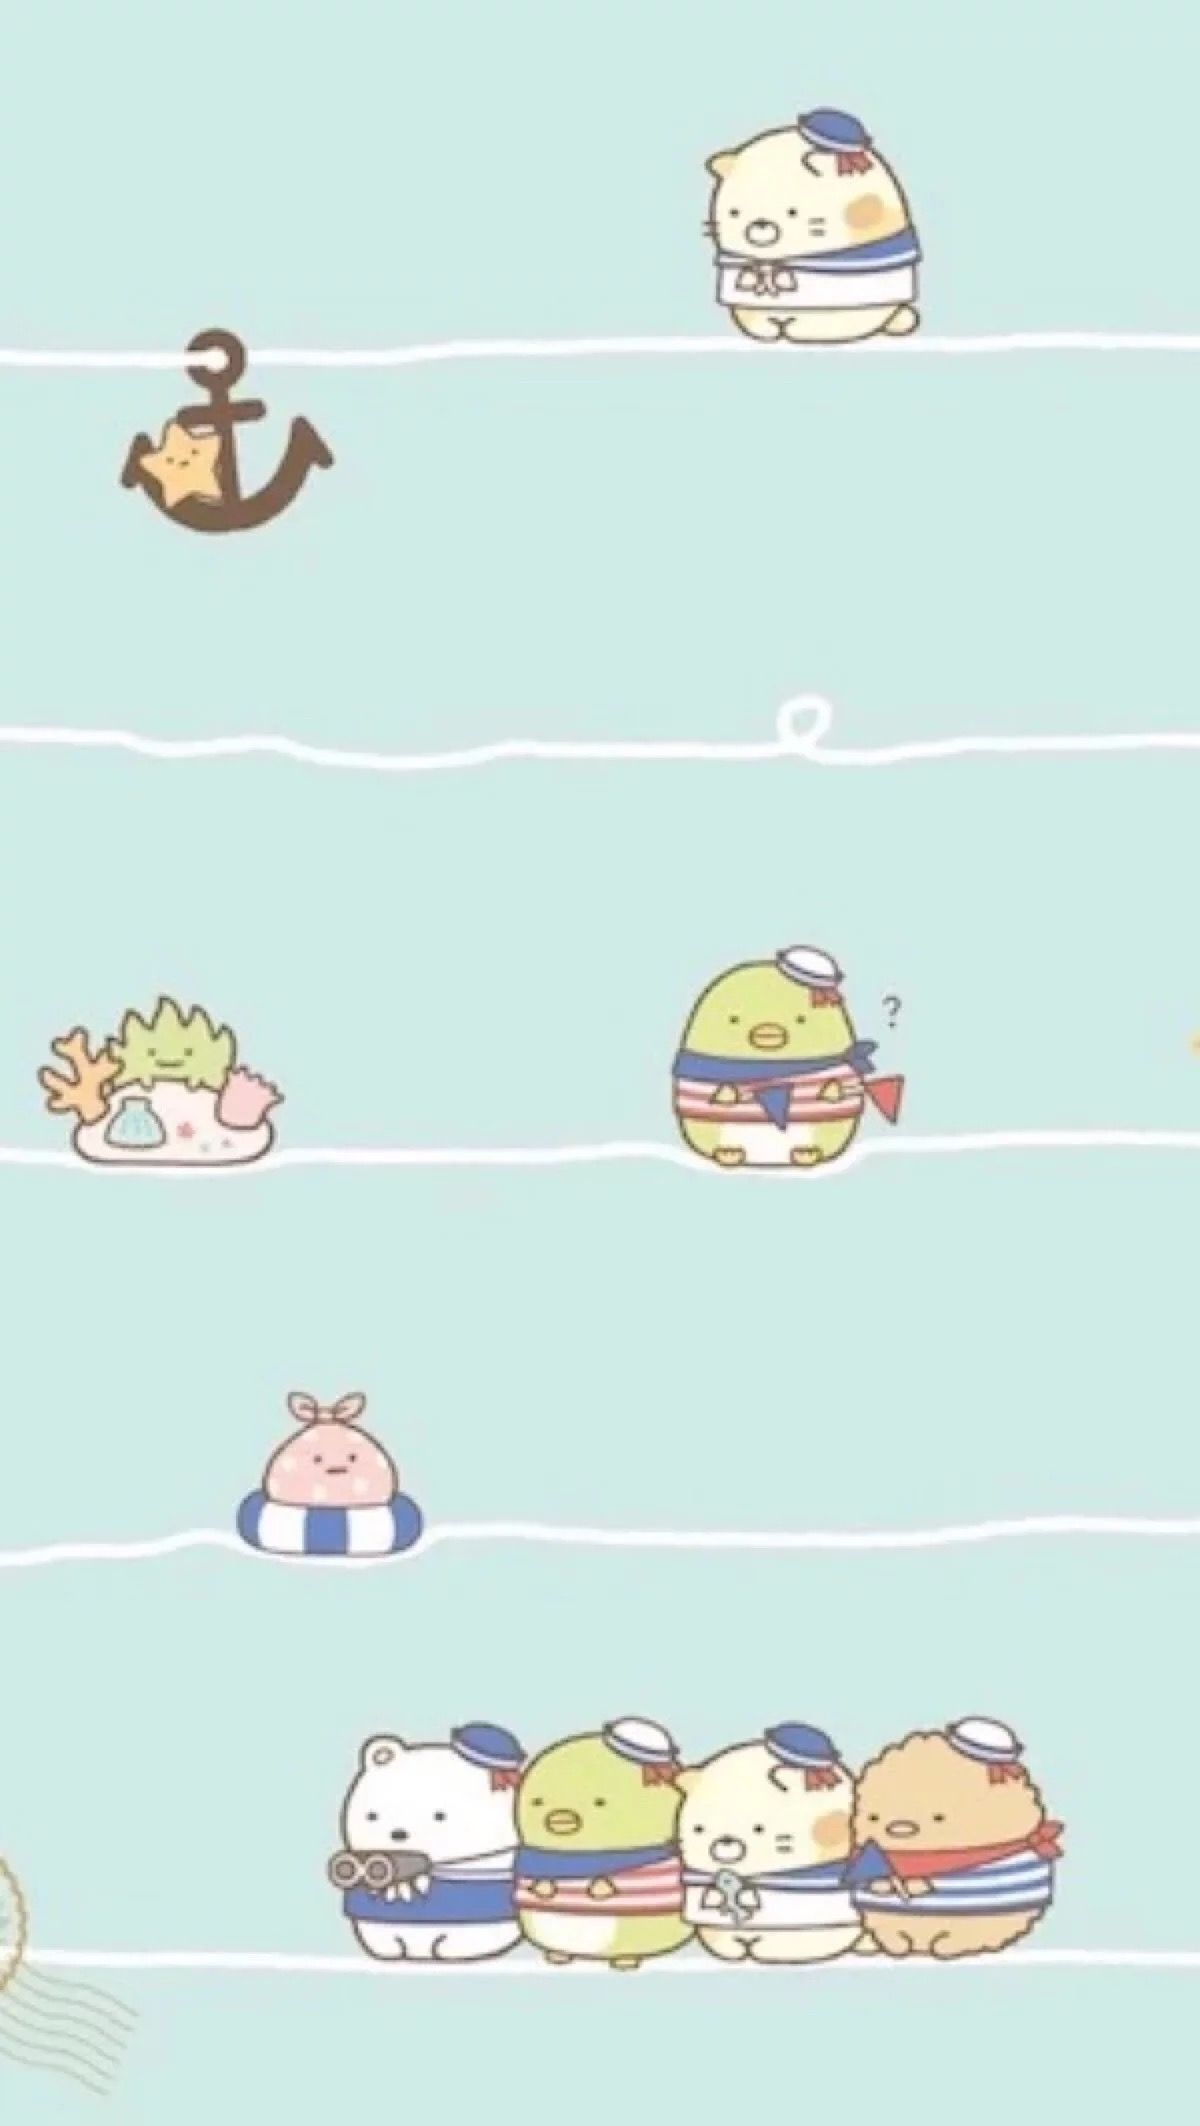 Pin By Pankeawป านแก ว On Home Screen Pinterest Kawaii Wallpaper